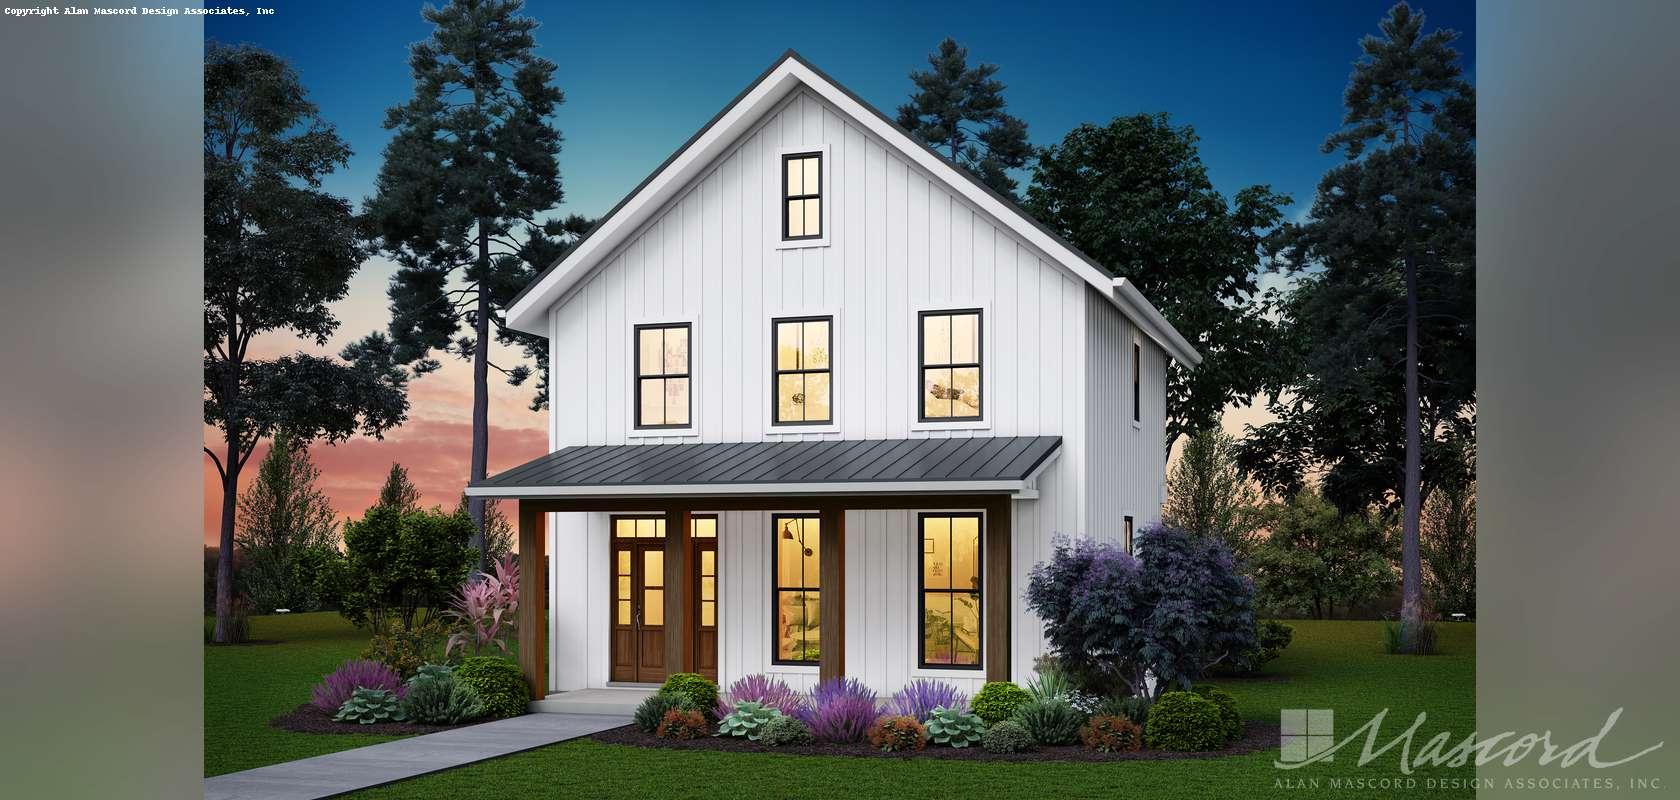 Mascord House Plan 21149A: The Mahoney